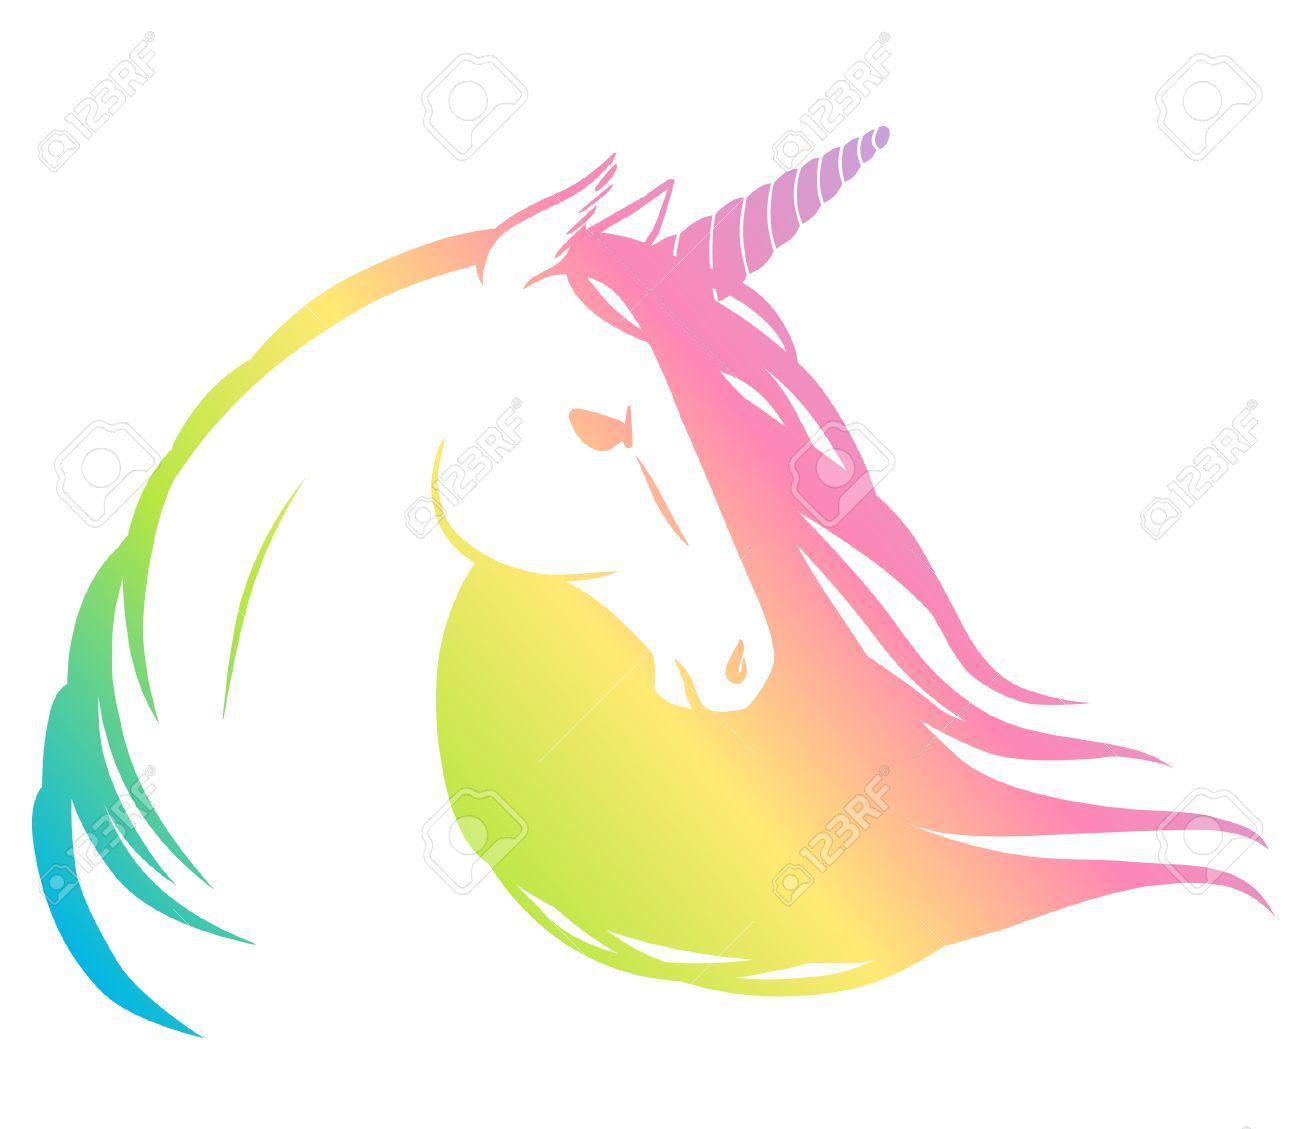 rainbow unicorn vector illustration royalty free cliparts vectors rh 123rf com free vector art rainbow unicorn free unicorn vector images